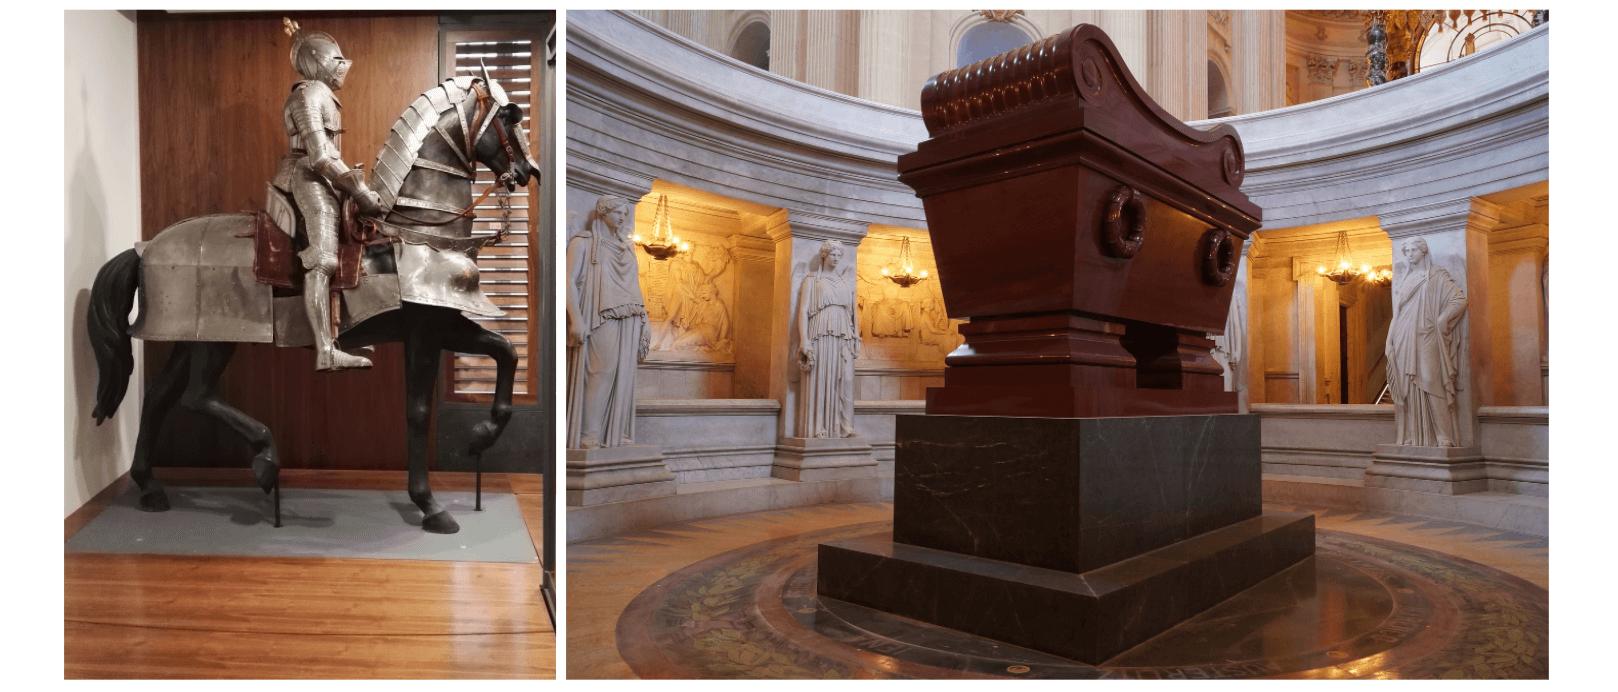 museus-em-paris-invalides